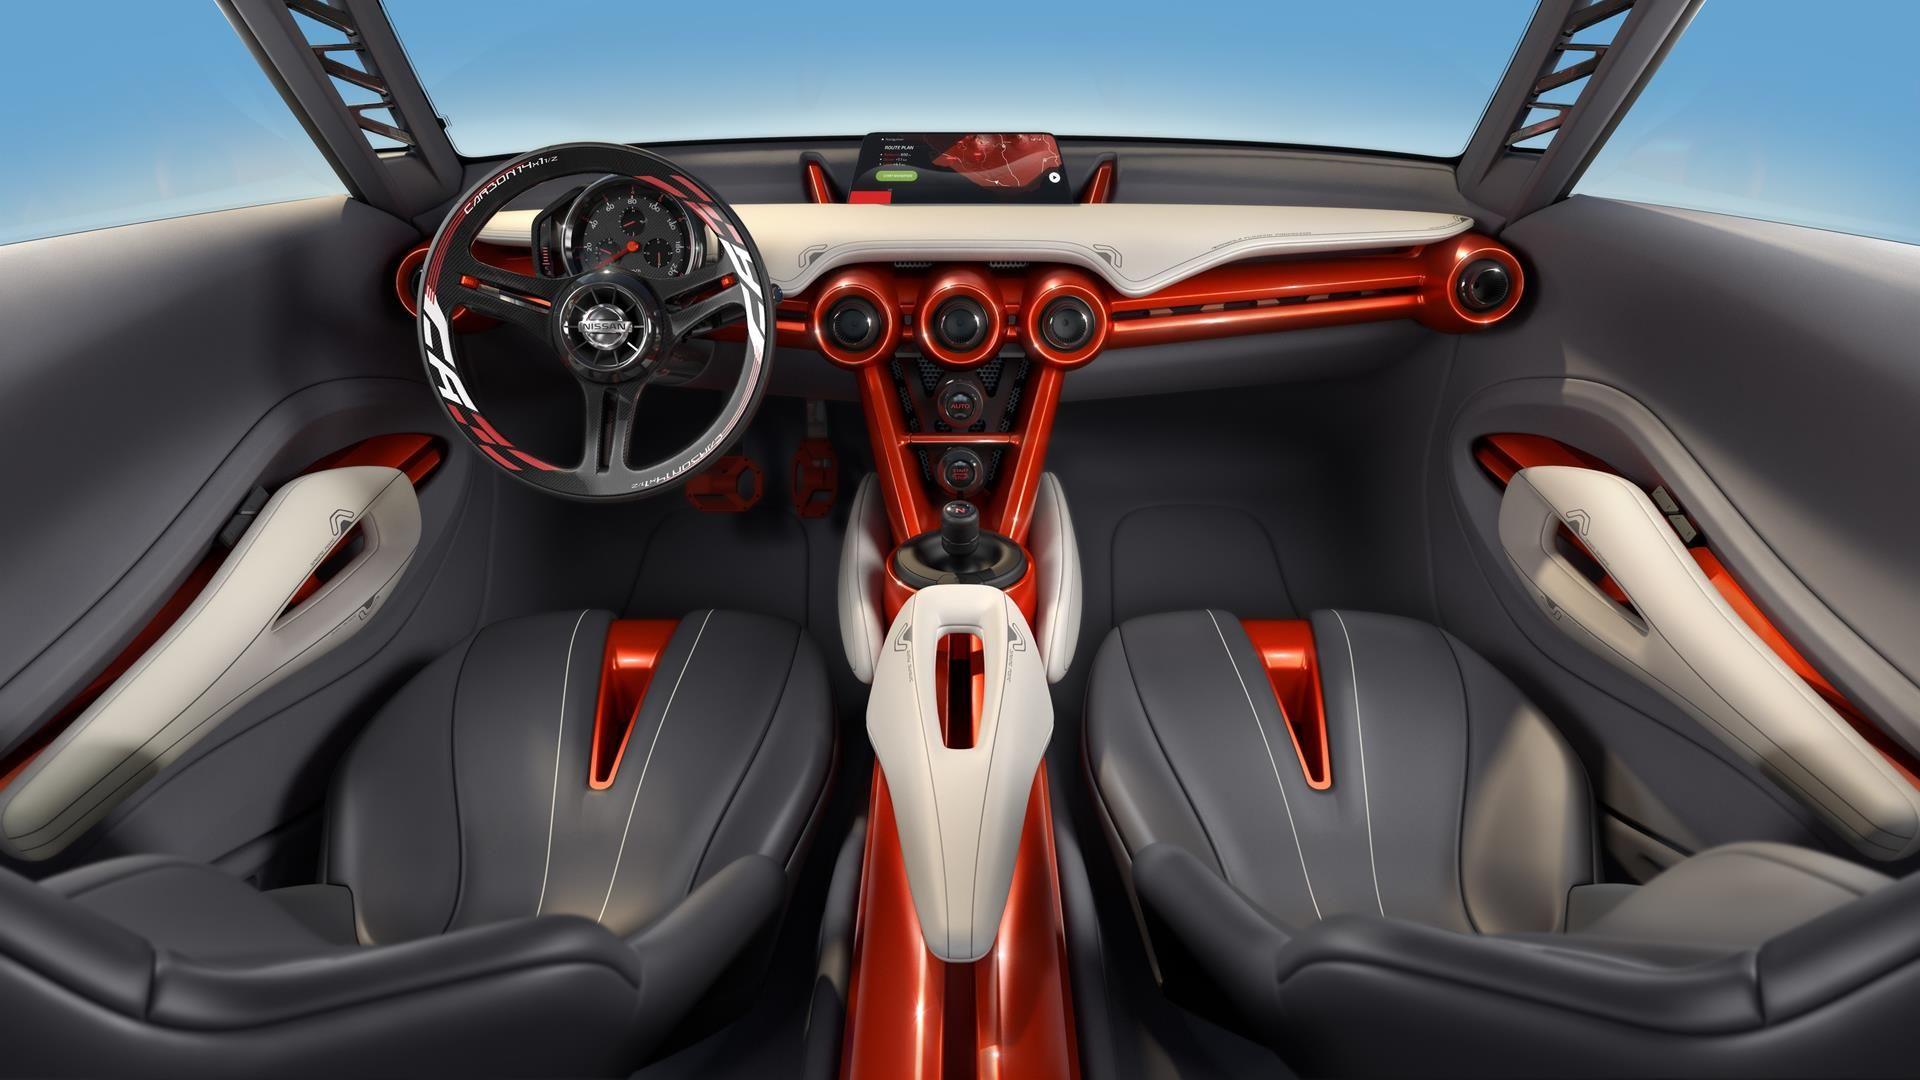 2015 Nissan Gripz Concept Images Nissan Sporty Suv Car Interior